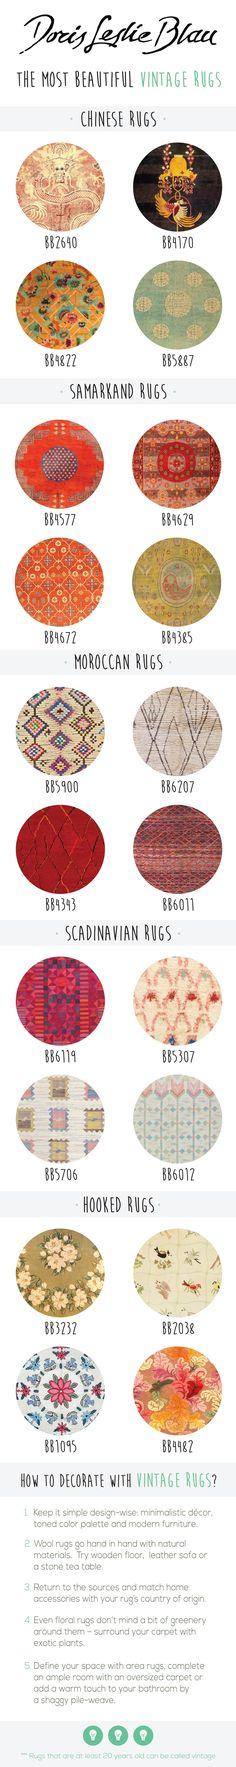 Vintage Rugs: Moroccan rug, Scandinavian rug, Chinese rug, oriental rug. interior decor in the vintage eclectic (Scandinavian, Moroccan) living room :)